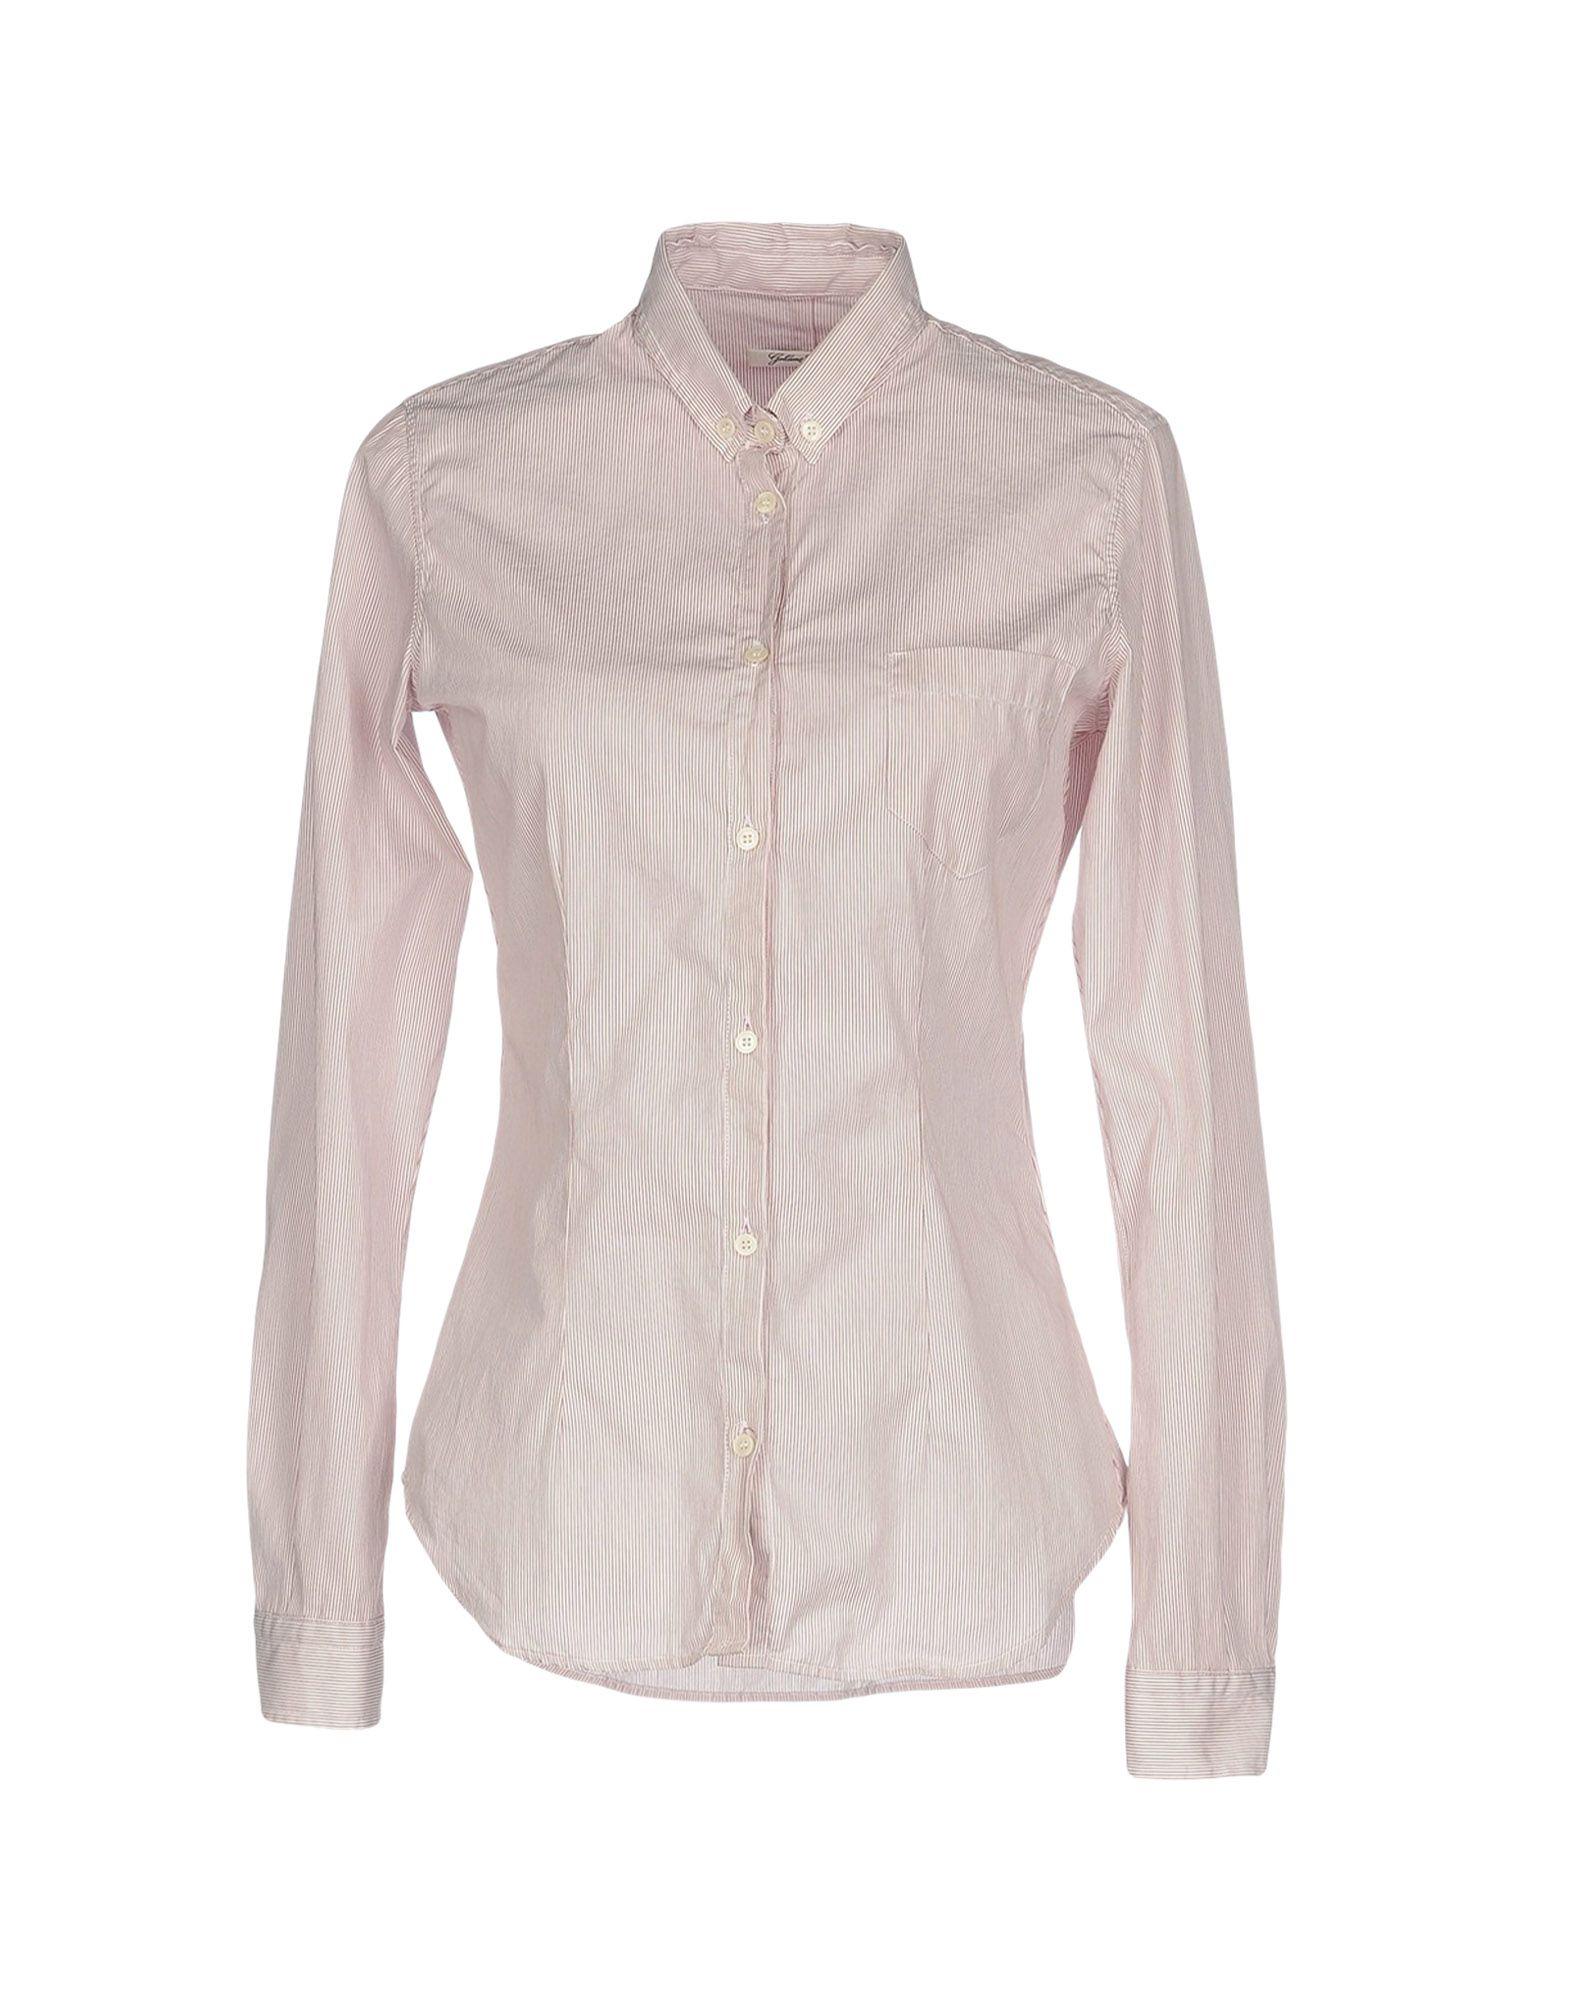 GOLDEN GOOSE DELUXE BRAND Damen Hemd Farbe Pflaume Größe 3 jetztbilligerkaufen